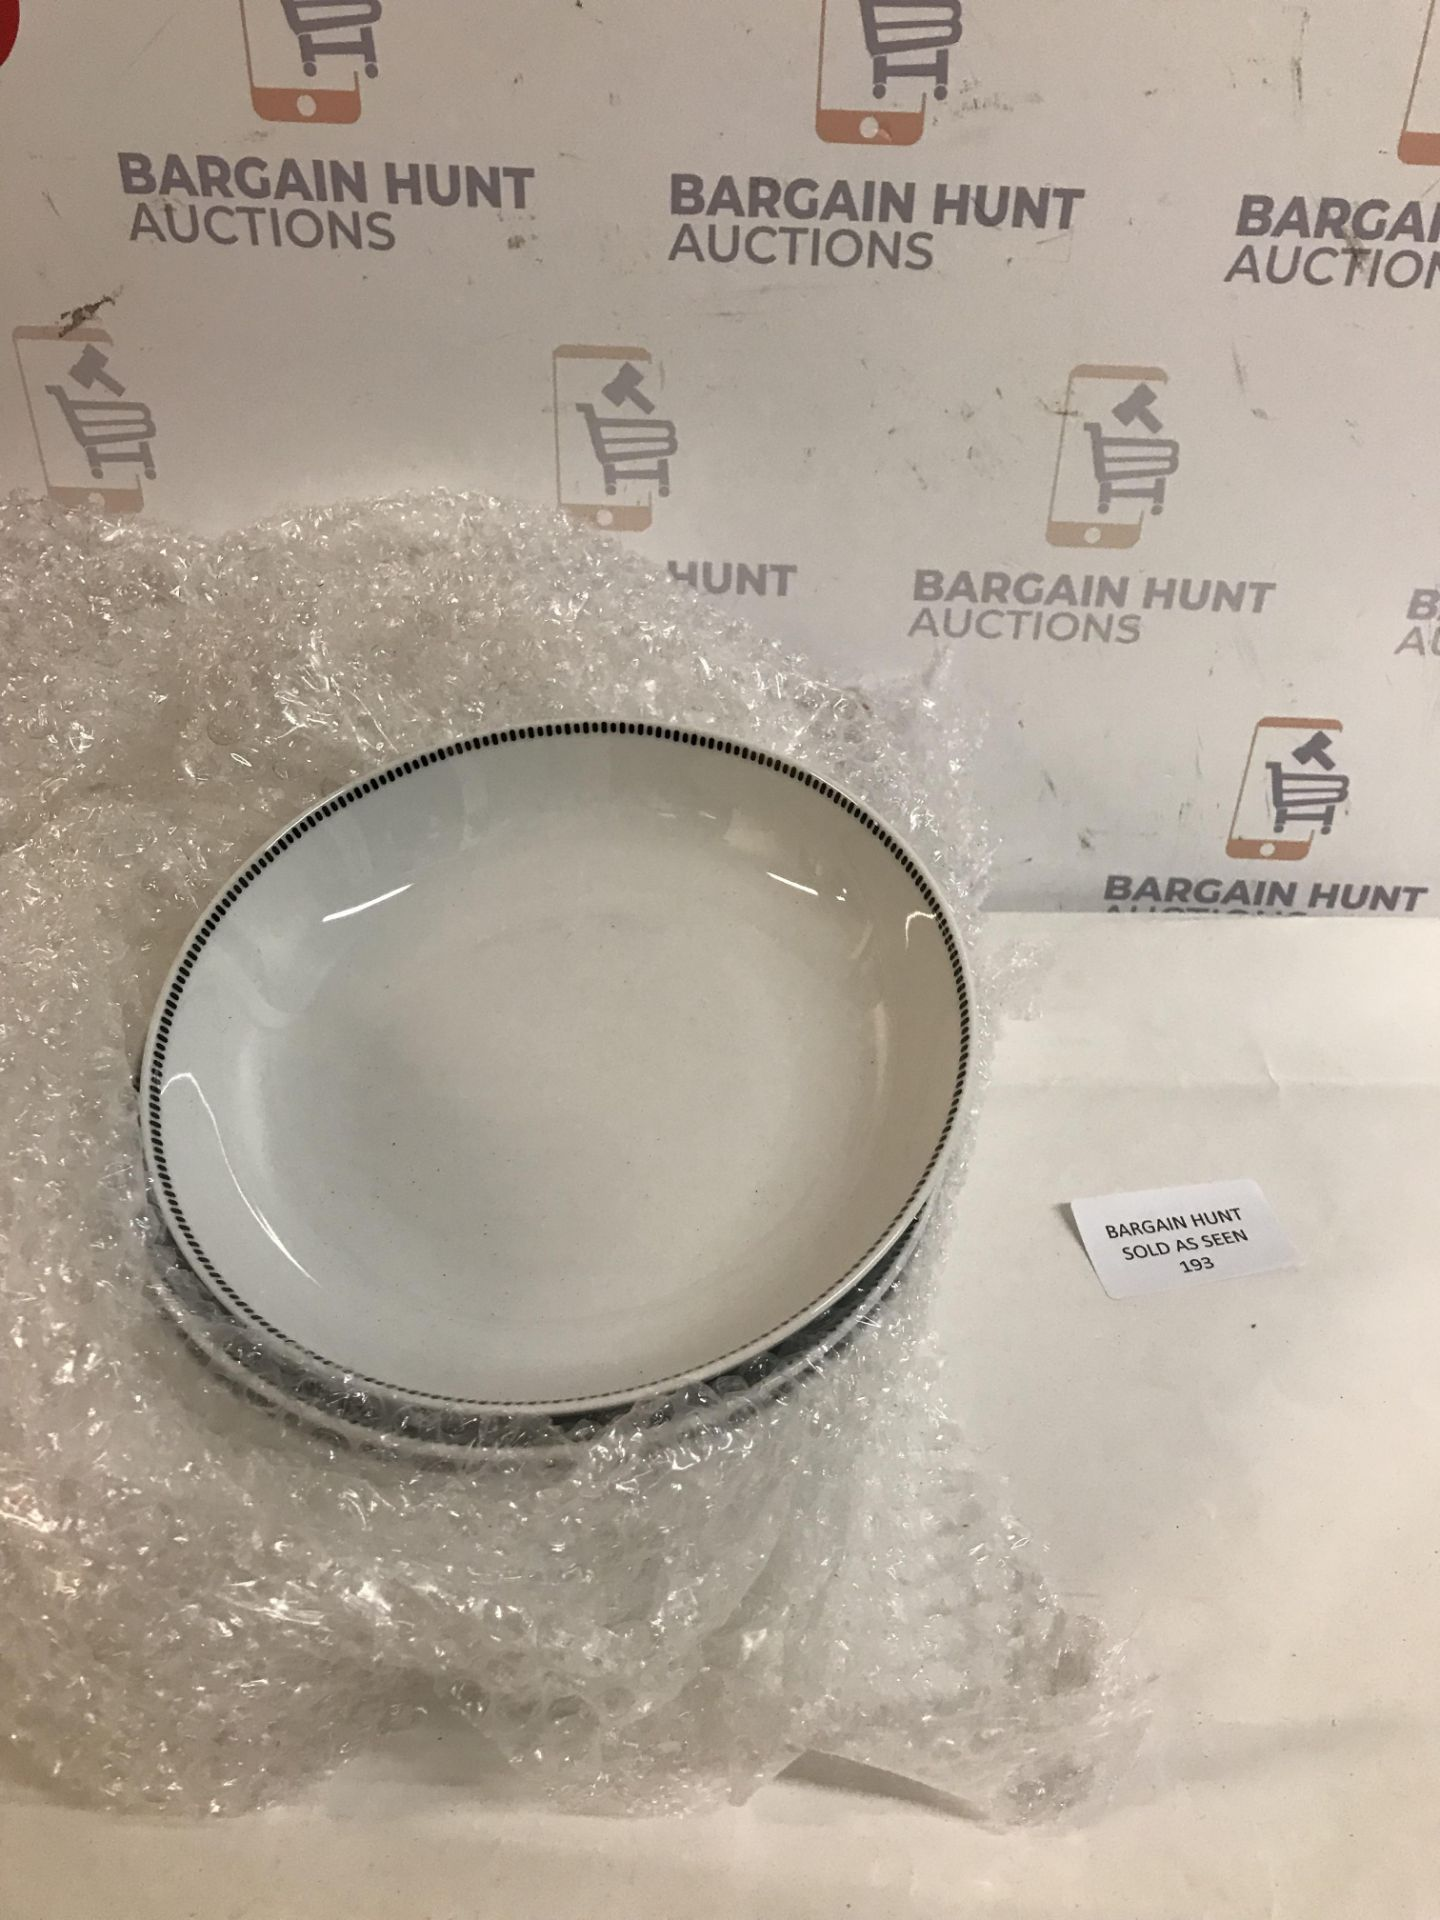 Lot 193 - Tally Porcelain Set of 4 Pasta Bowls